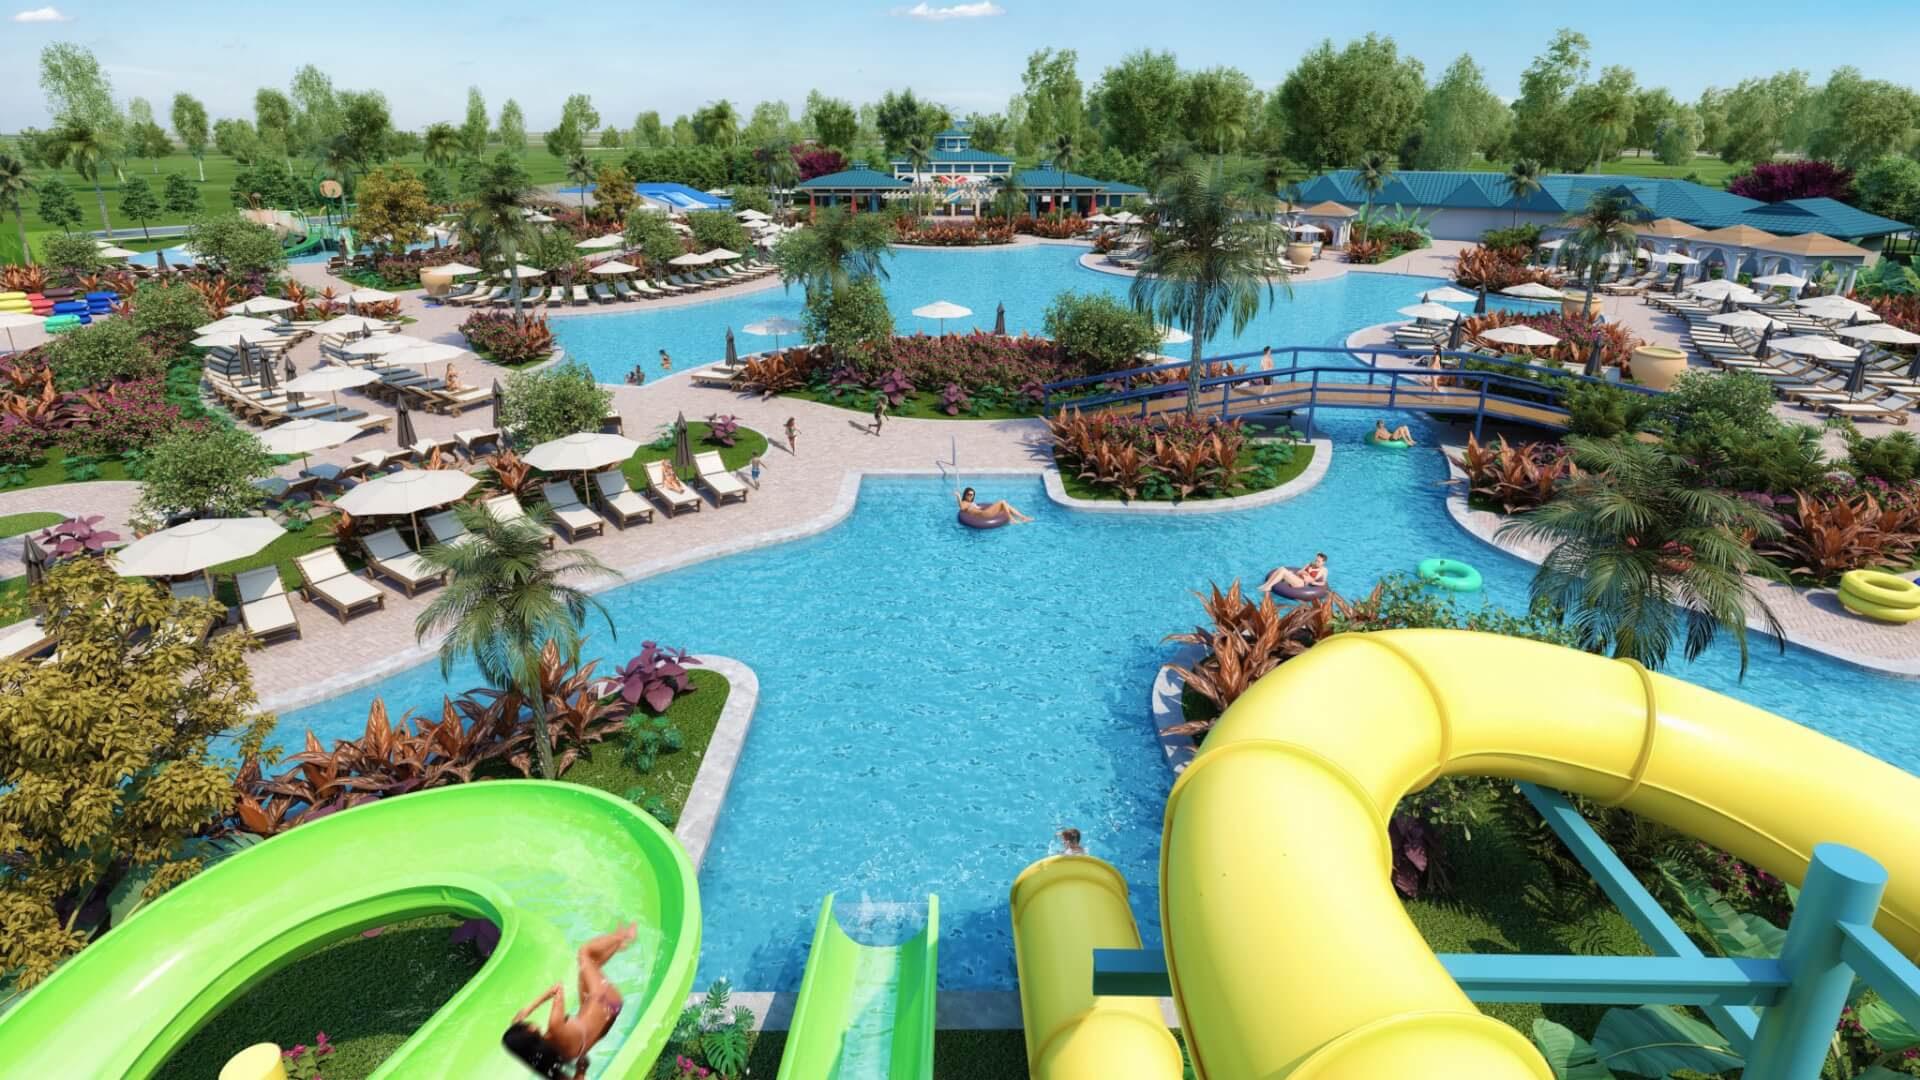 The Grove Resort  Spa breaks ground on new Surfari Water